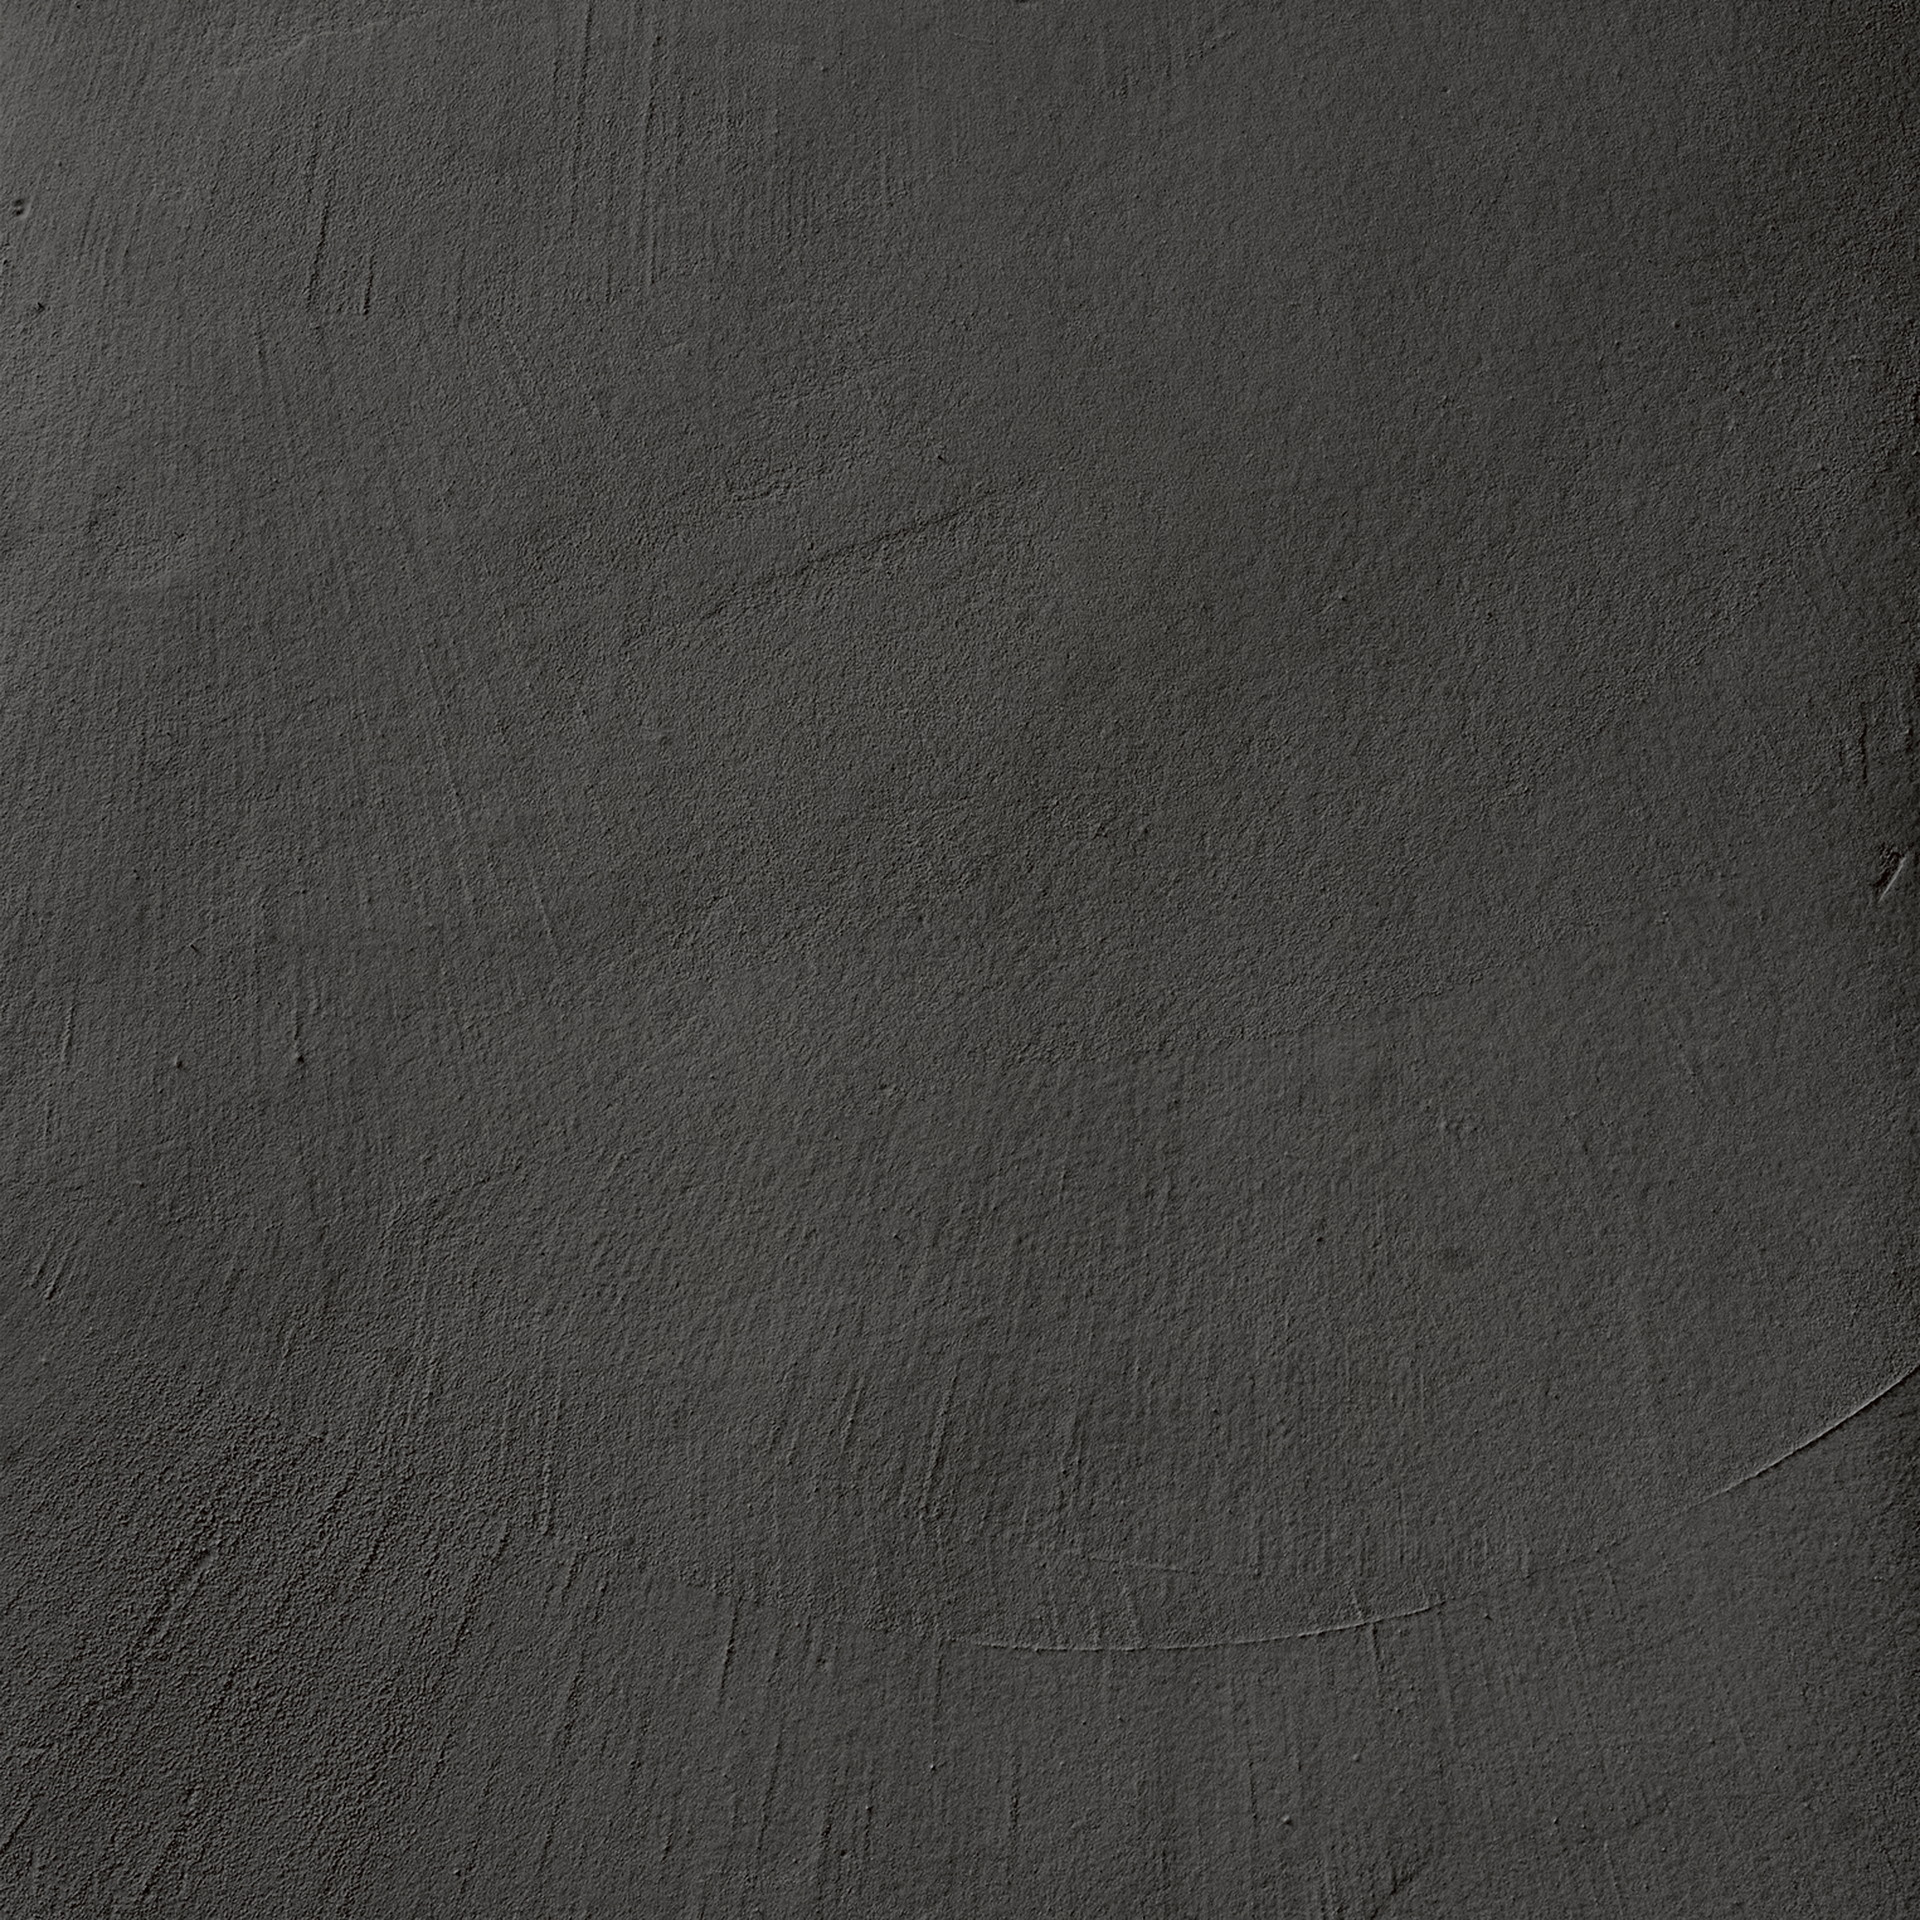 Material TerraFloor - Fine Grain Clay and Resin Mix Coating | Matter of Stuff